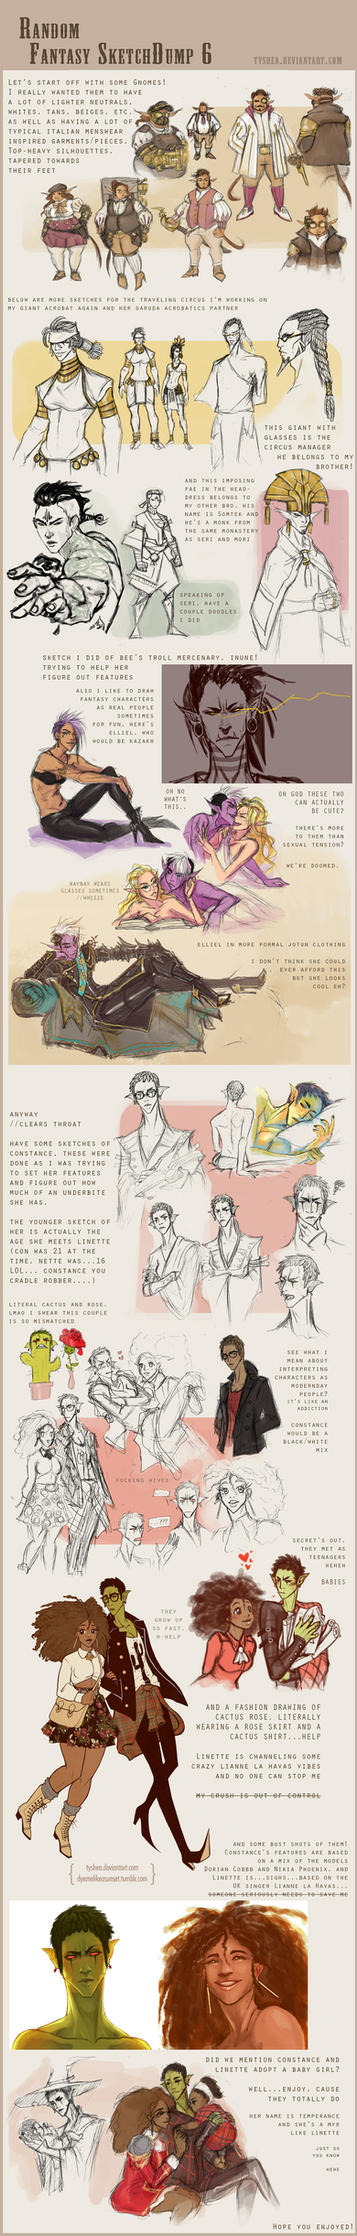 Fantasy Sketchdump 6 by Dyemelikeasunset